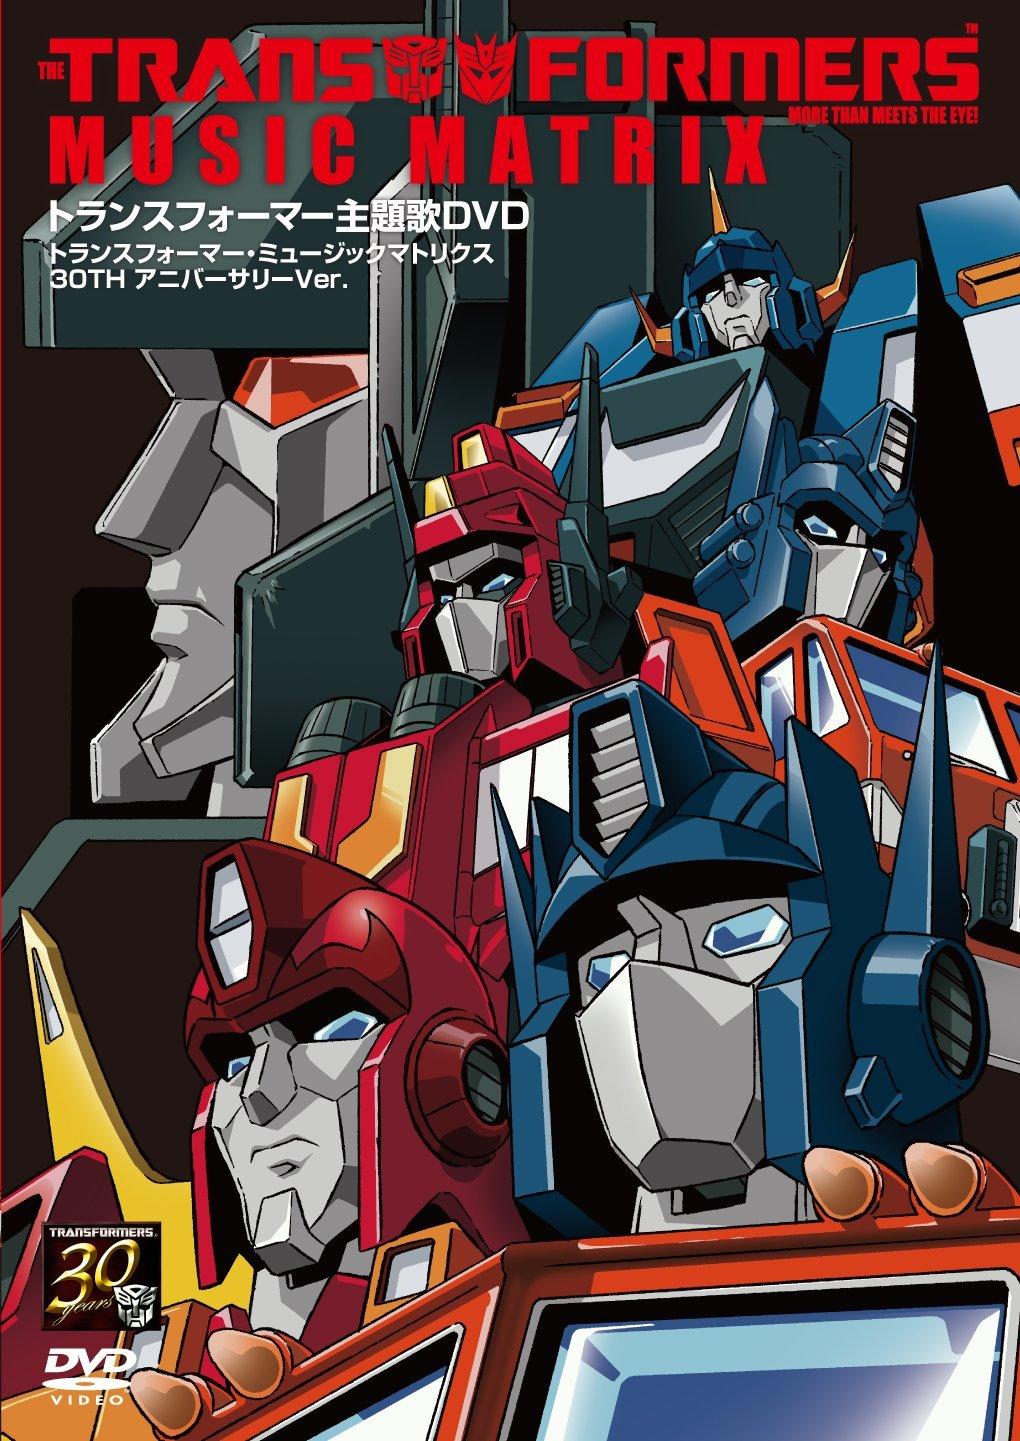 27463852d1409244576-new-japanese-transformers-dvd-cd-preorder-amazon-jp-8123wftgo6l_sl1500_